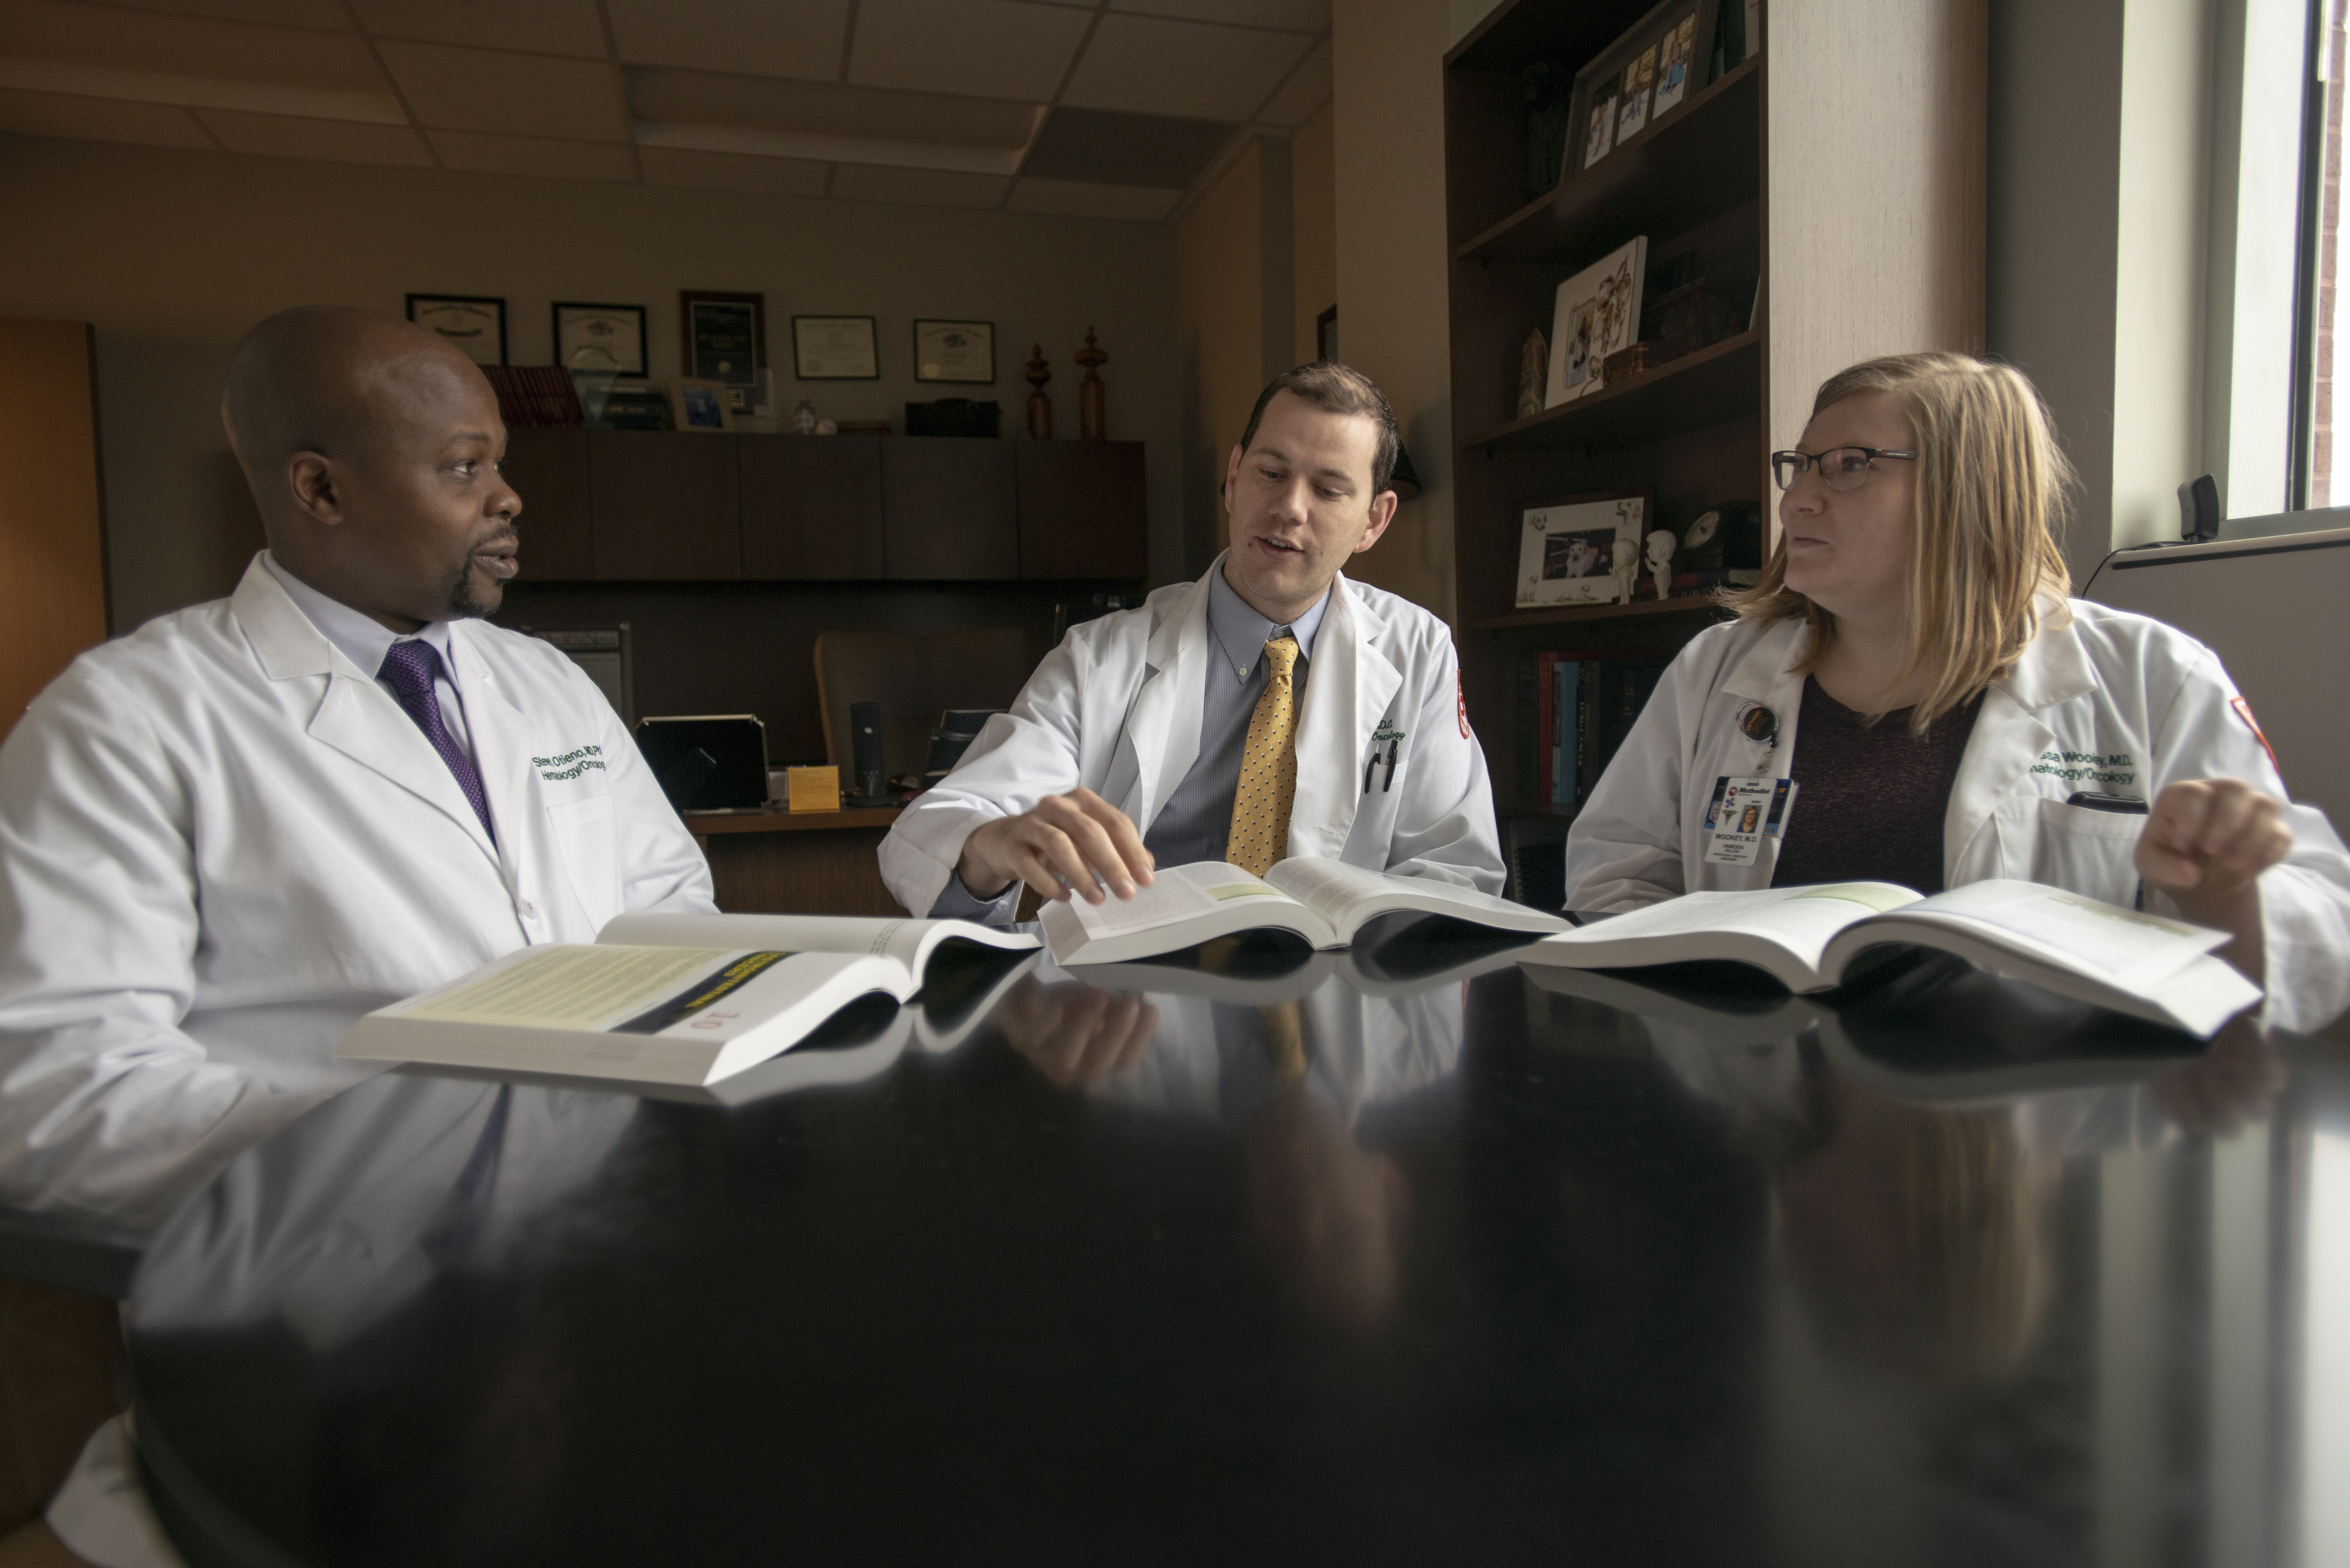 Hematology & Oncology Fellowship - West Cancer Center